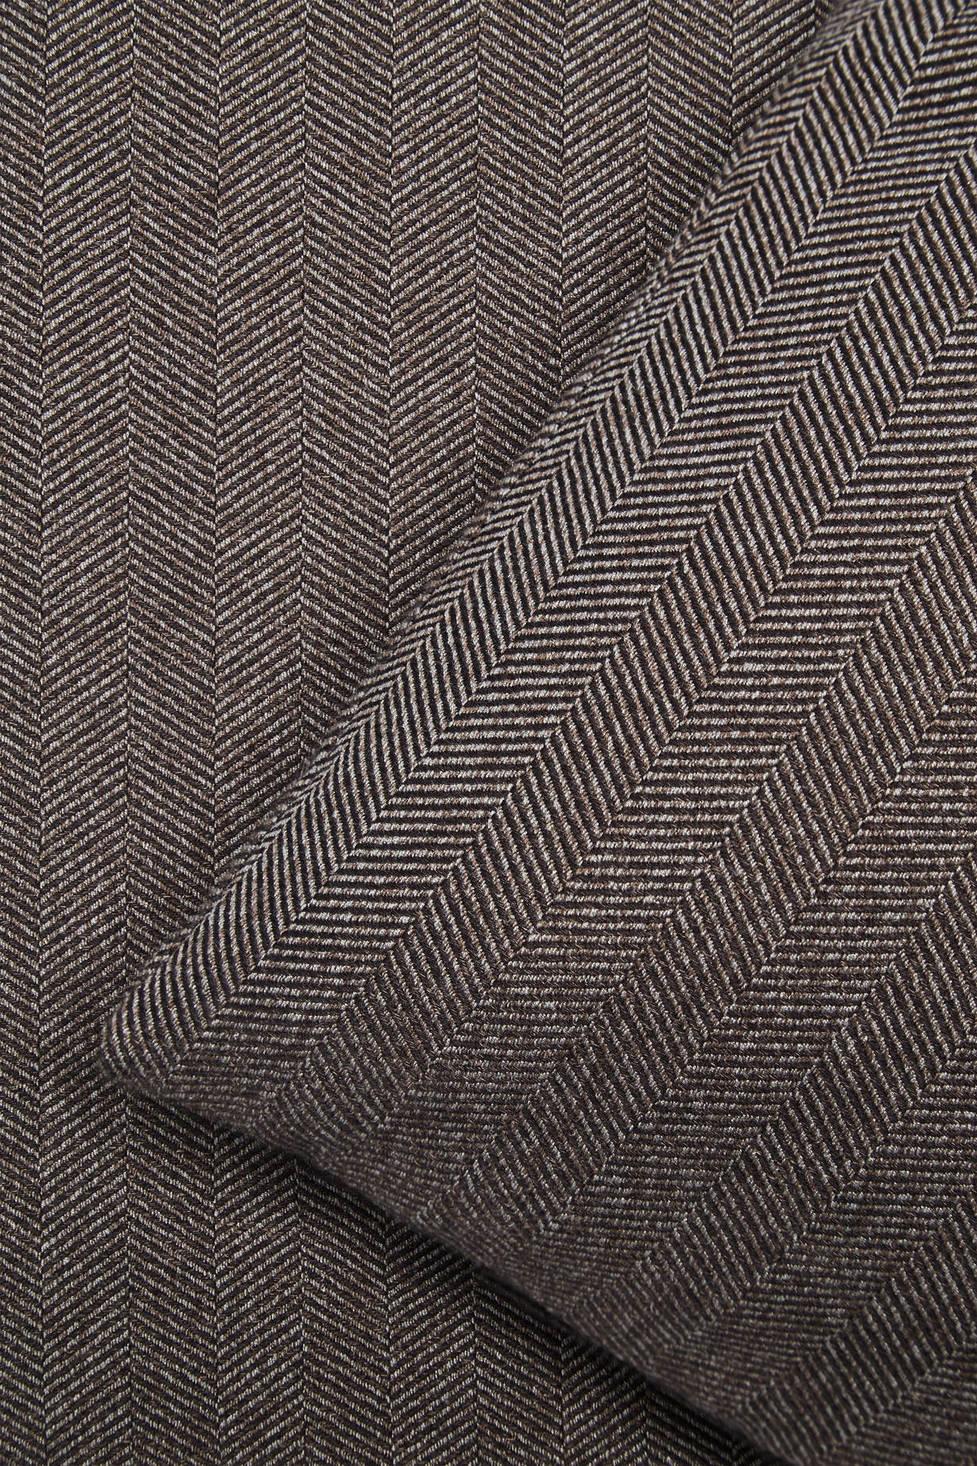 MARX Stool - Fabric Up Close.jpg